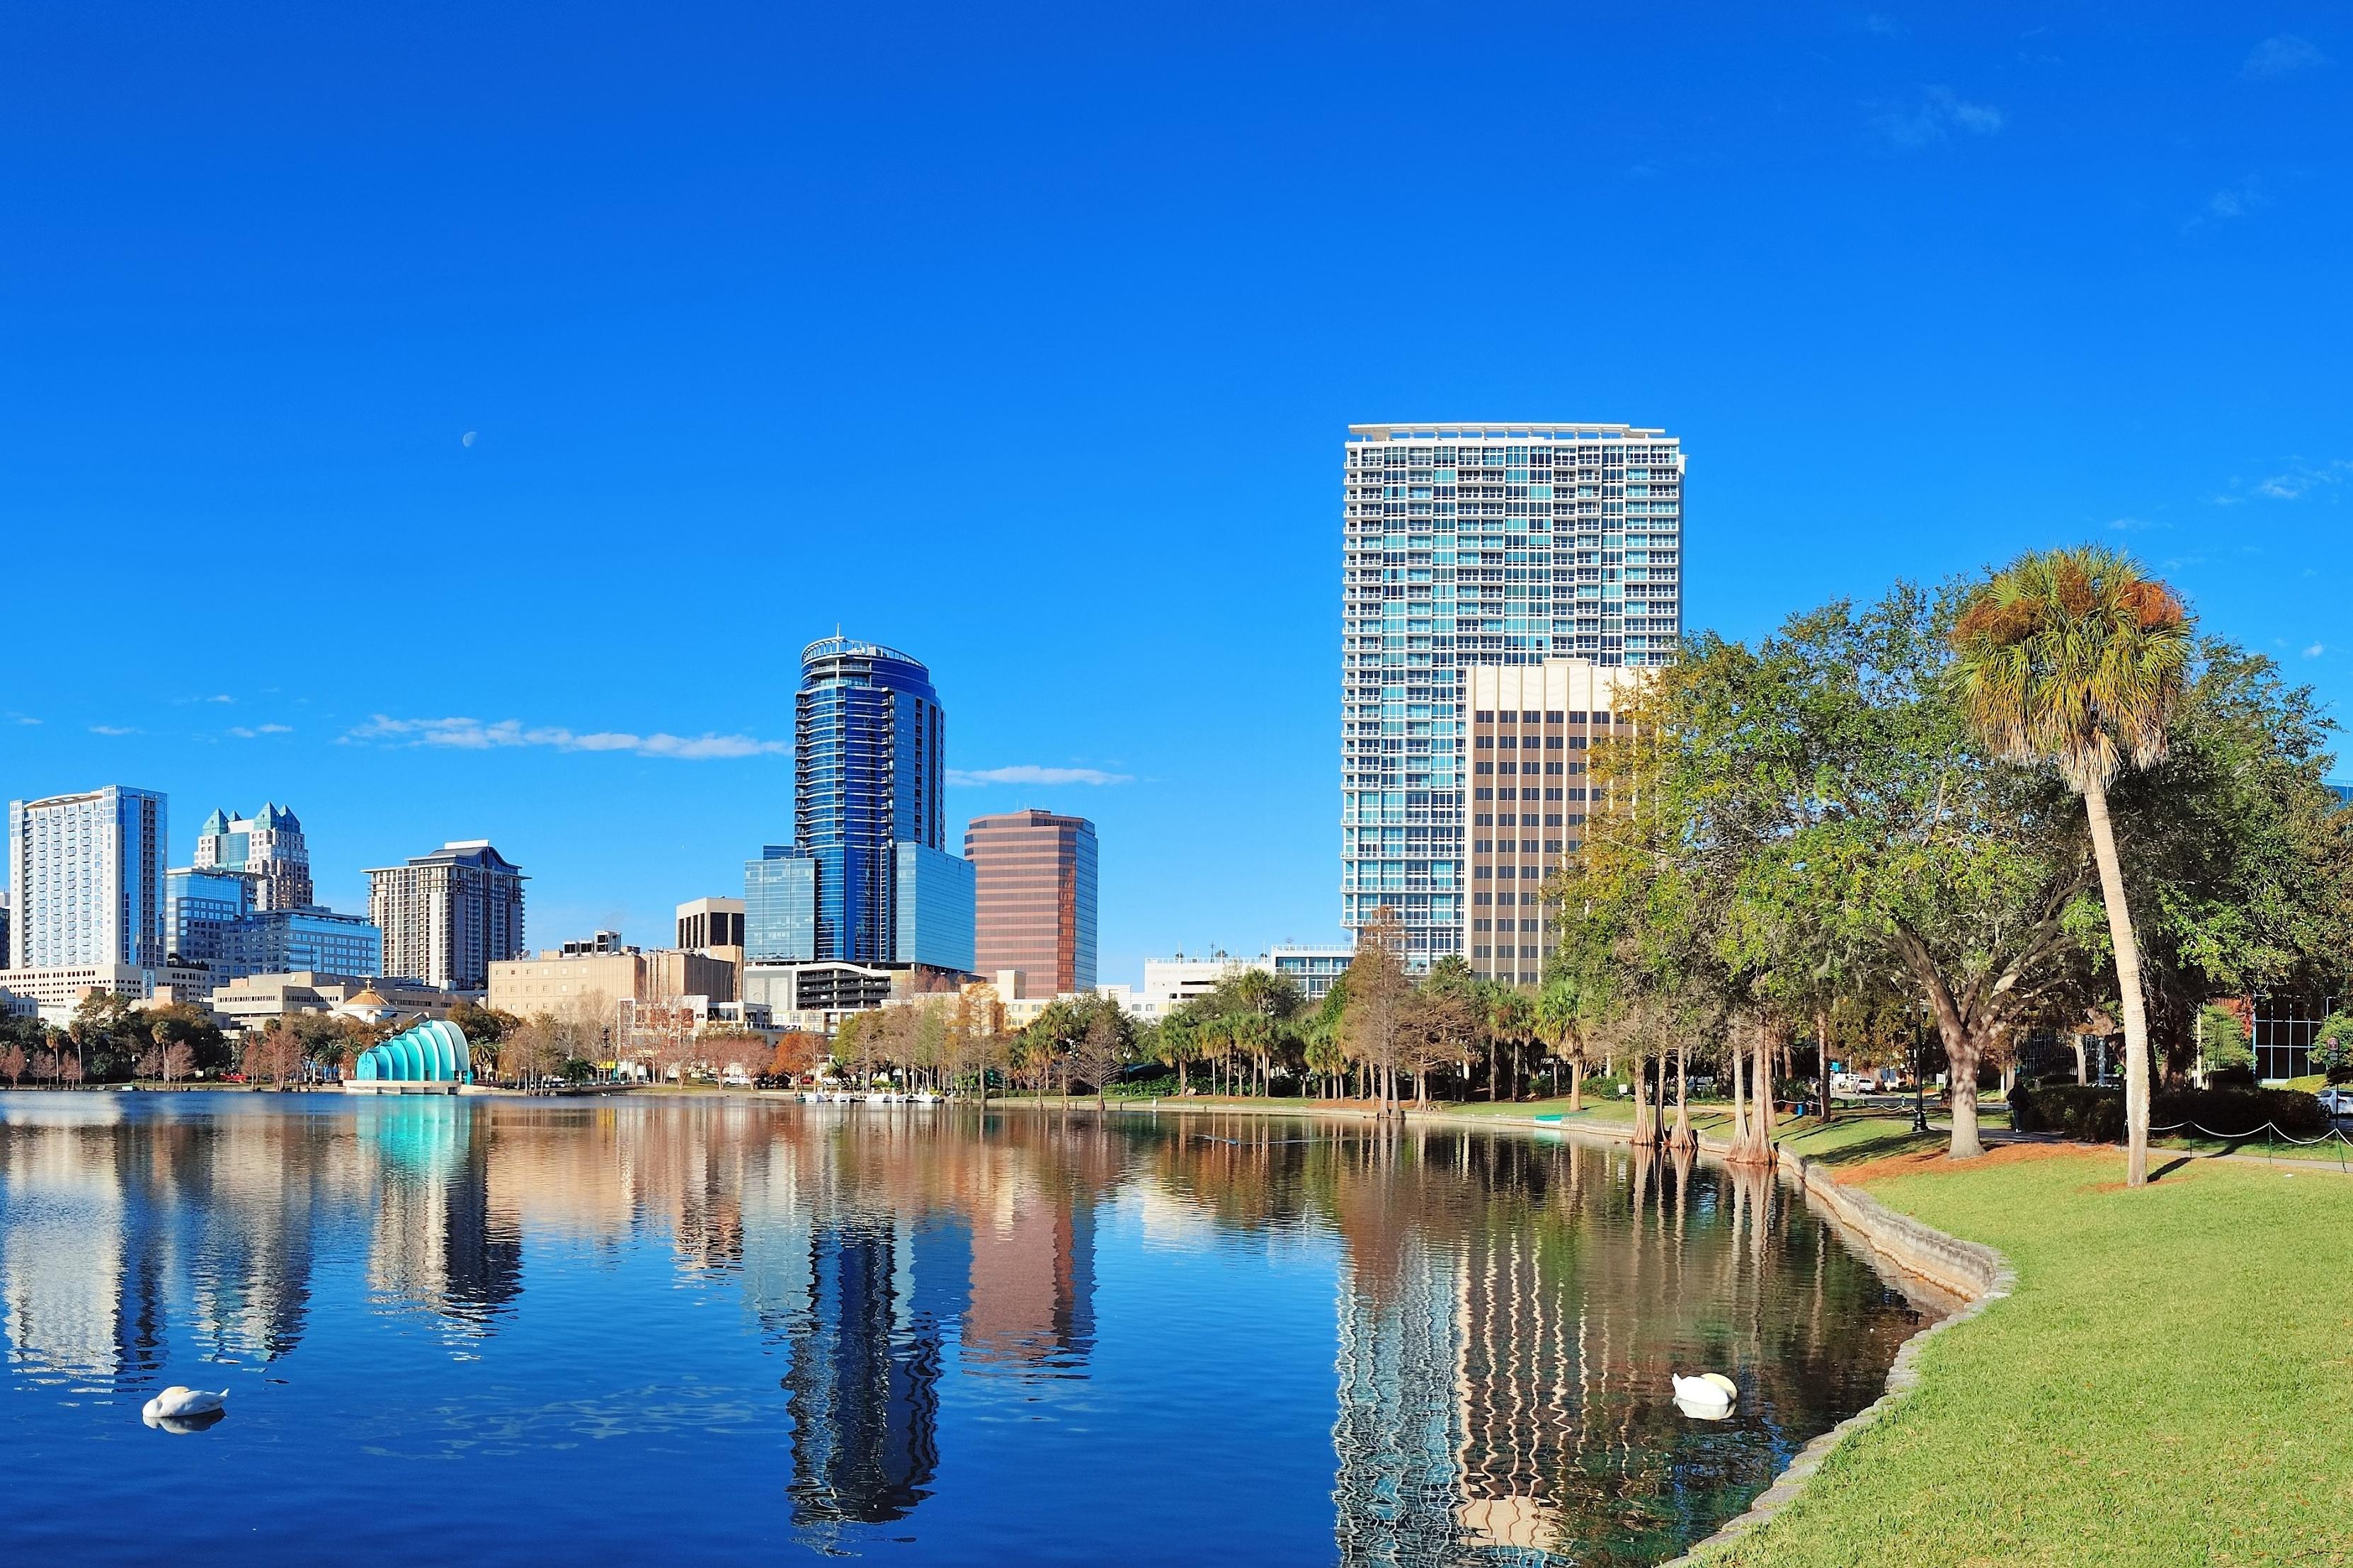 Orlando_iStock-256288-edited.jpg